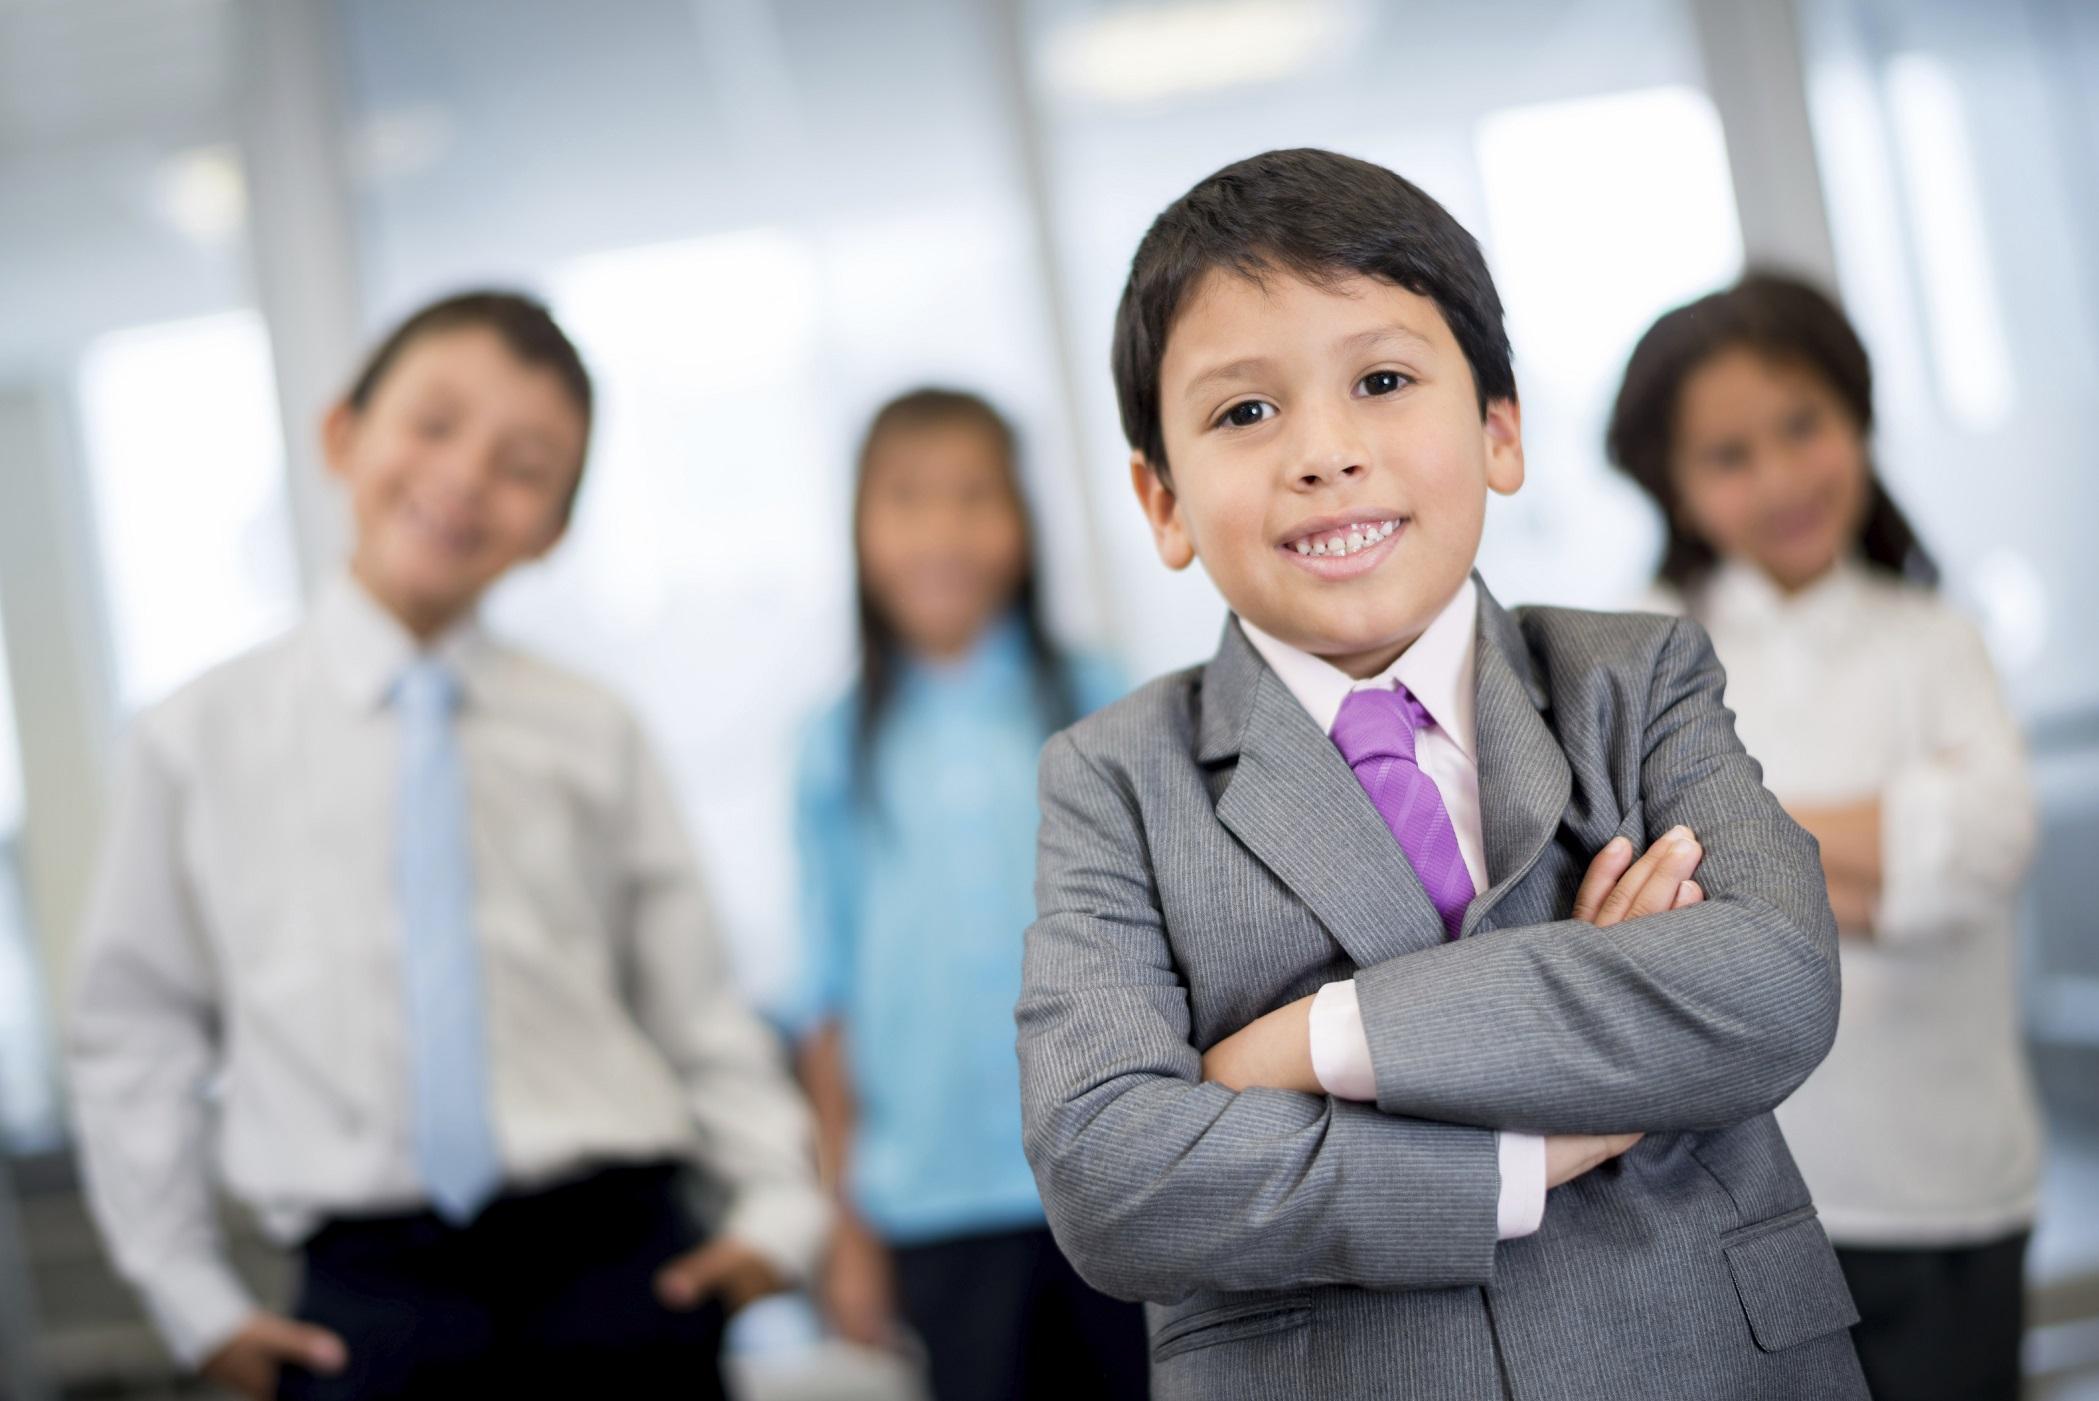 Building self-confidence in children